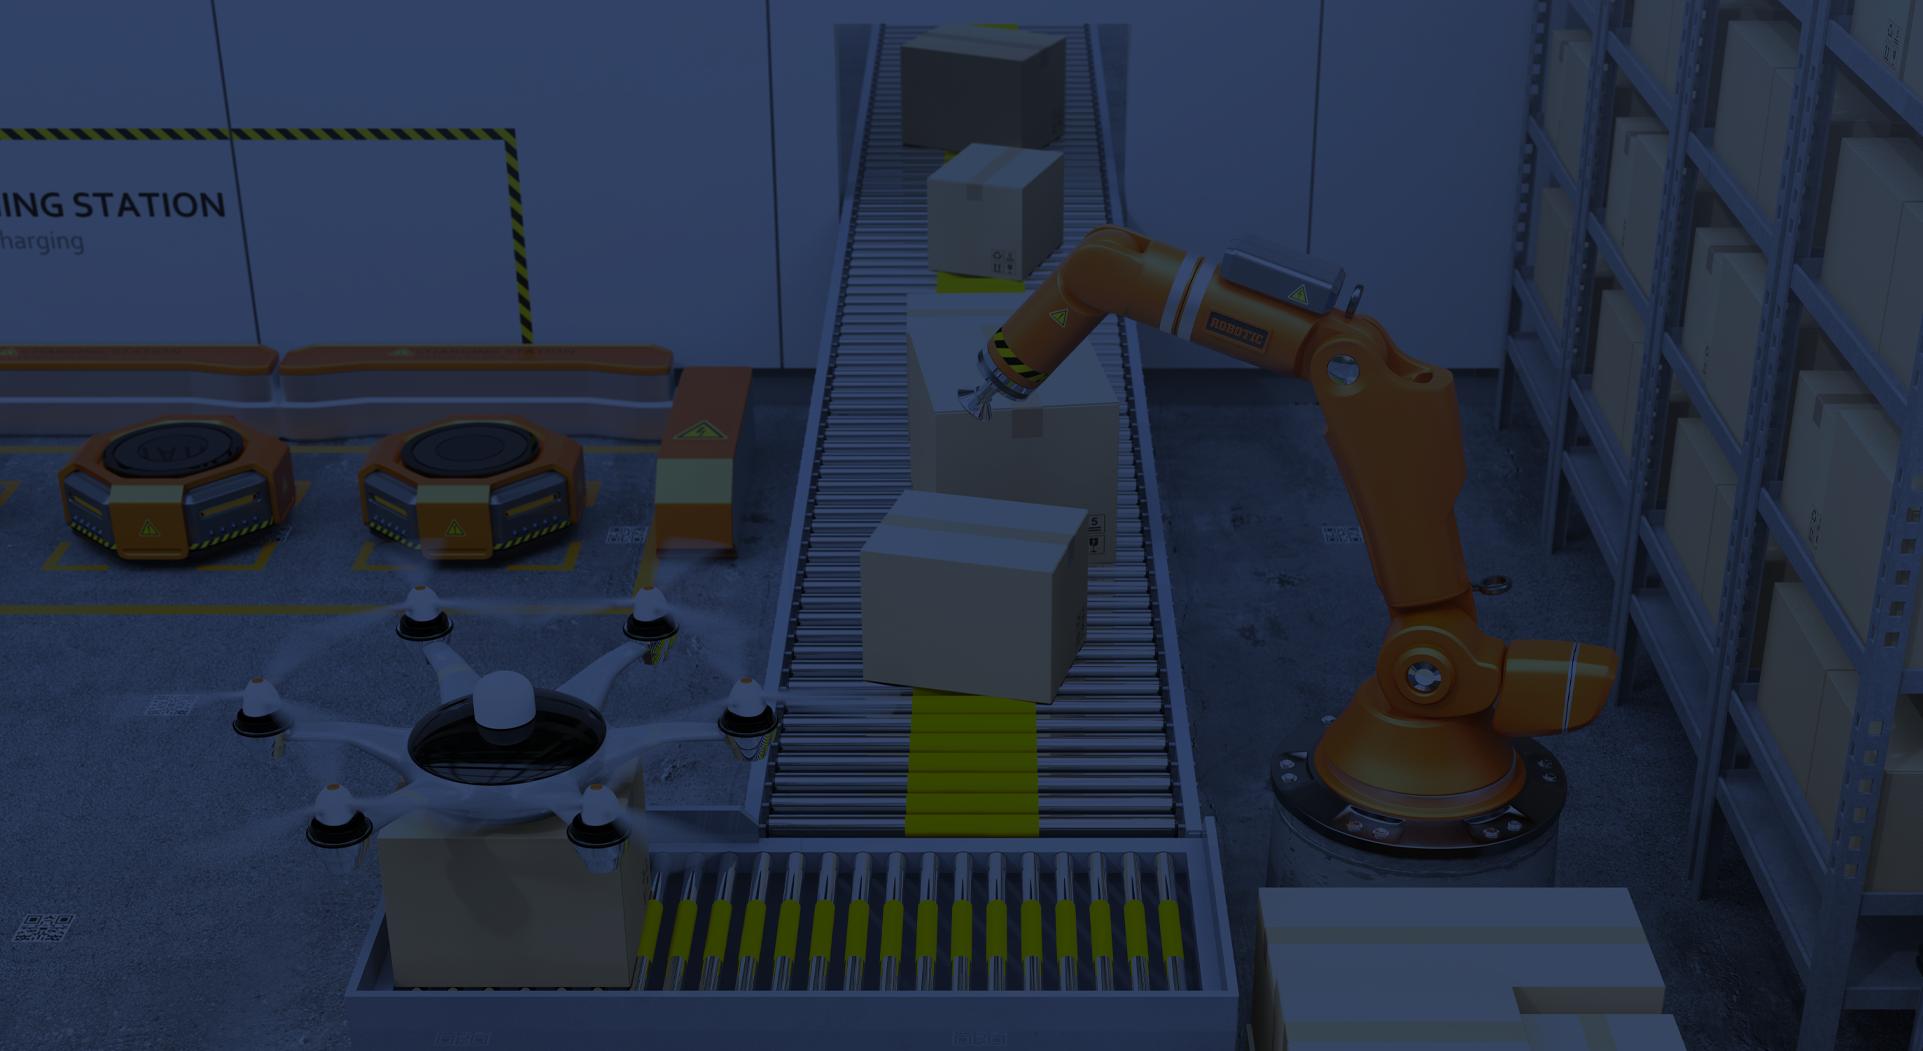 Future of Warehouse Automation - Oct 2020